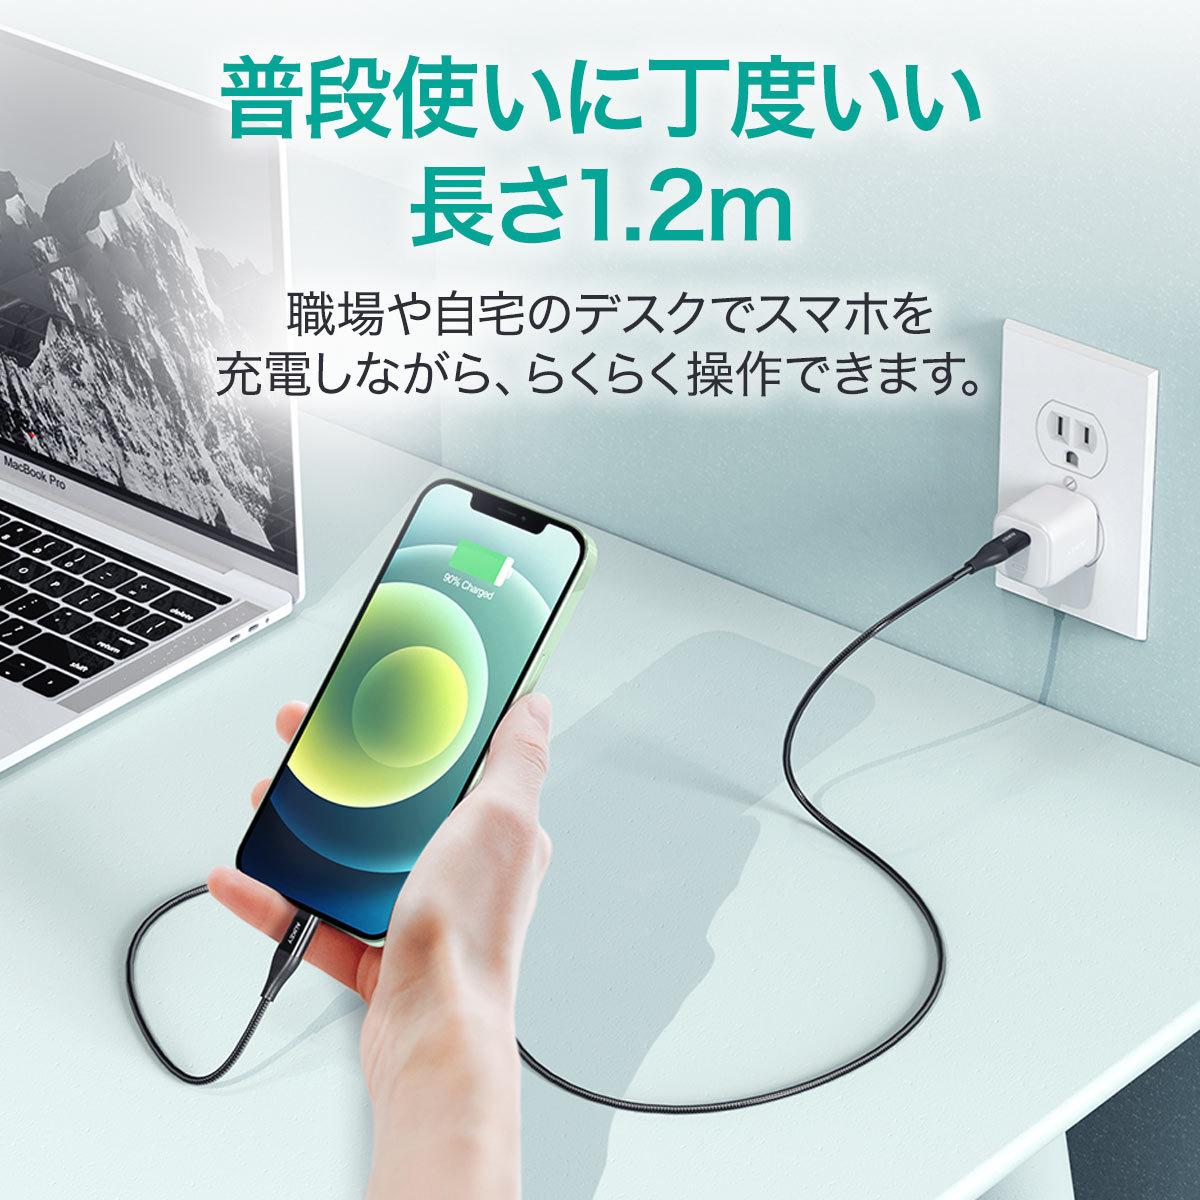 Impulse Series USB-C to Lightningケーブル(1.2m)CB-CL12